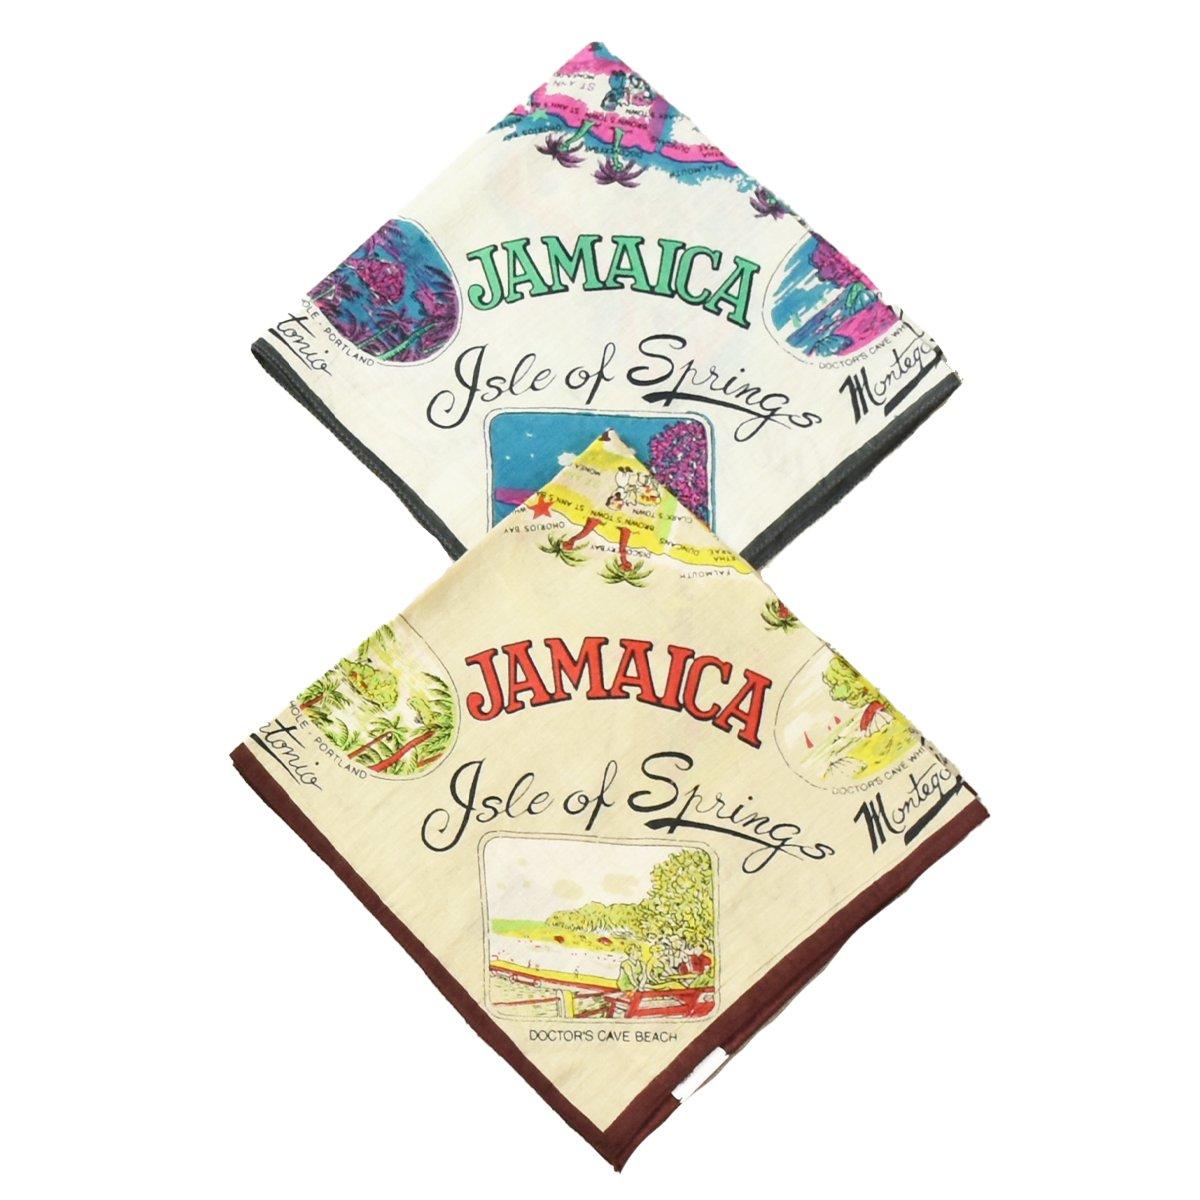 【BINDU】Jamaica Map Bandana (2Color)                           </a>             <span class=